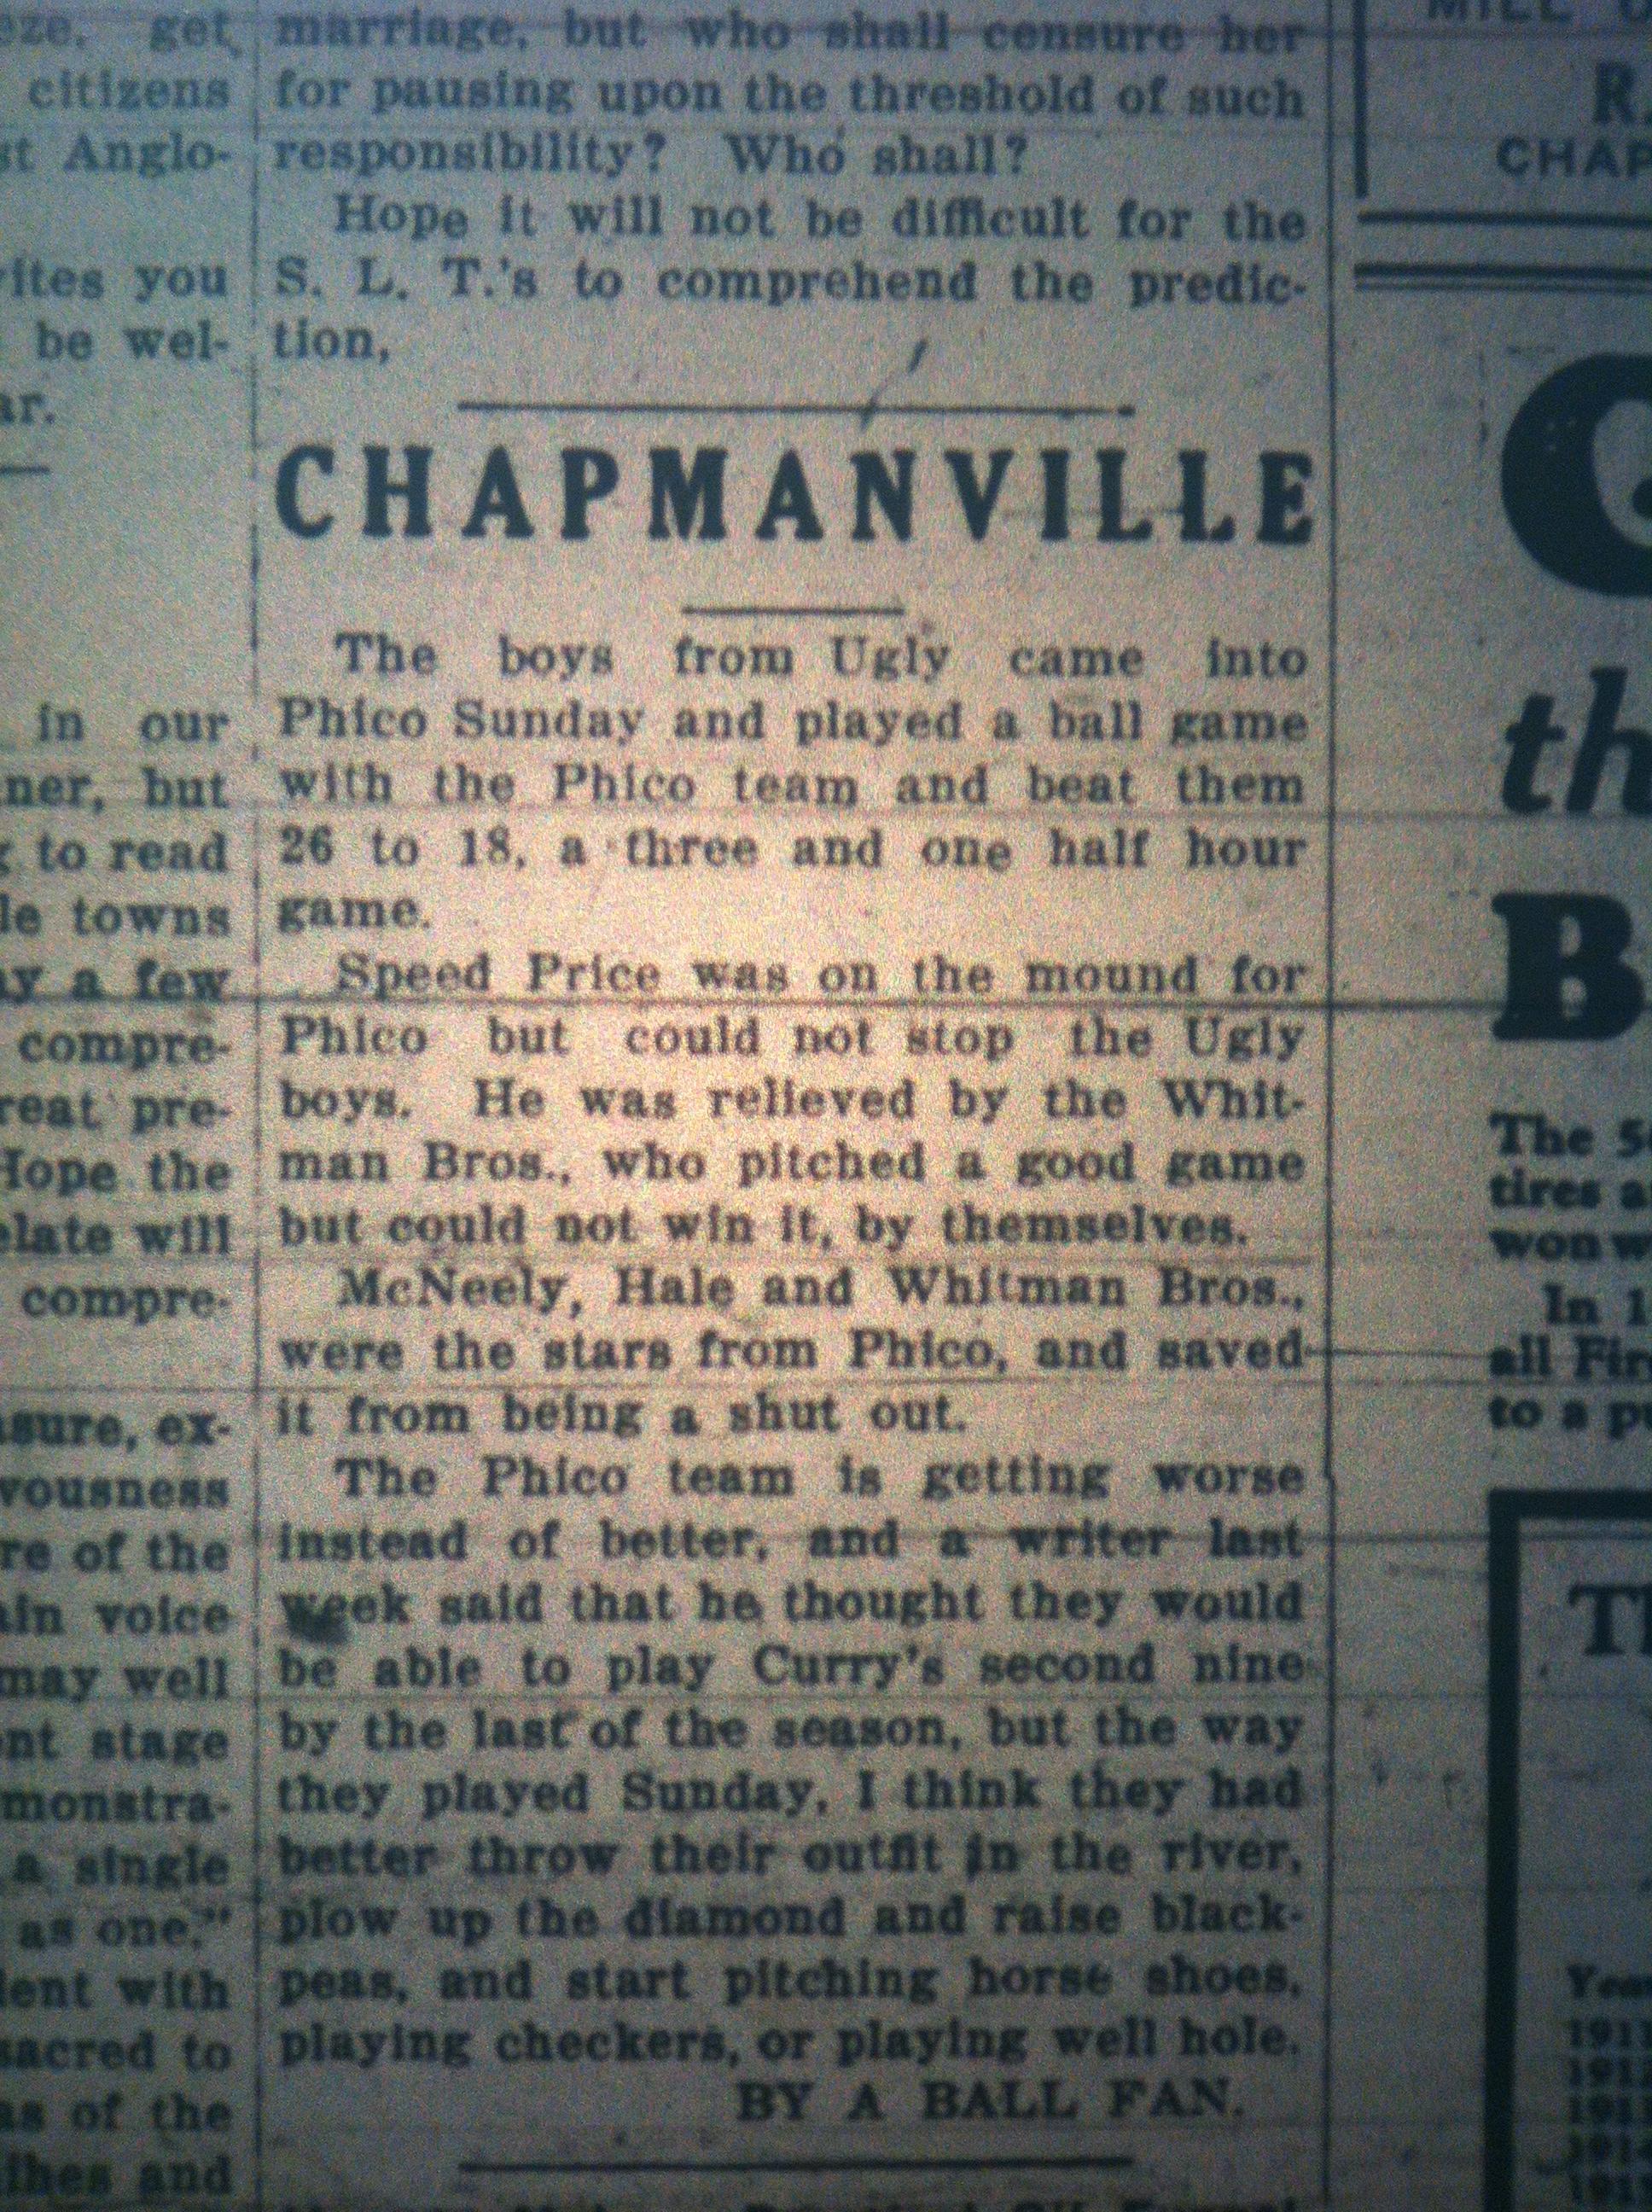 Chapmanville News LB 06.11.1926 1.JPG